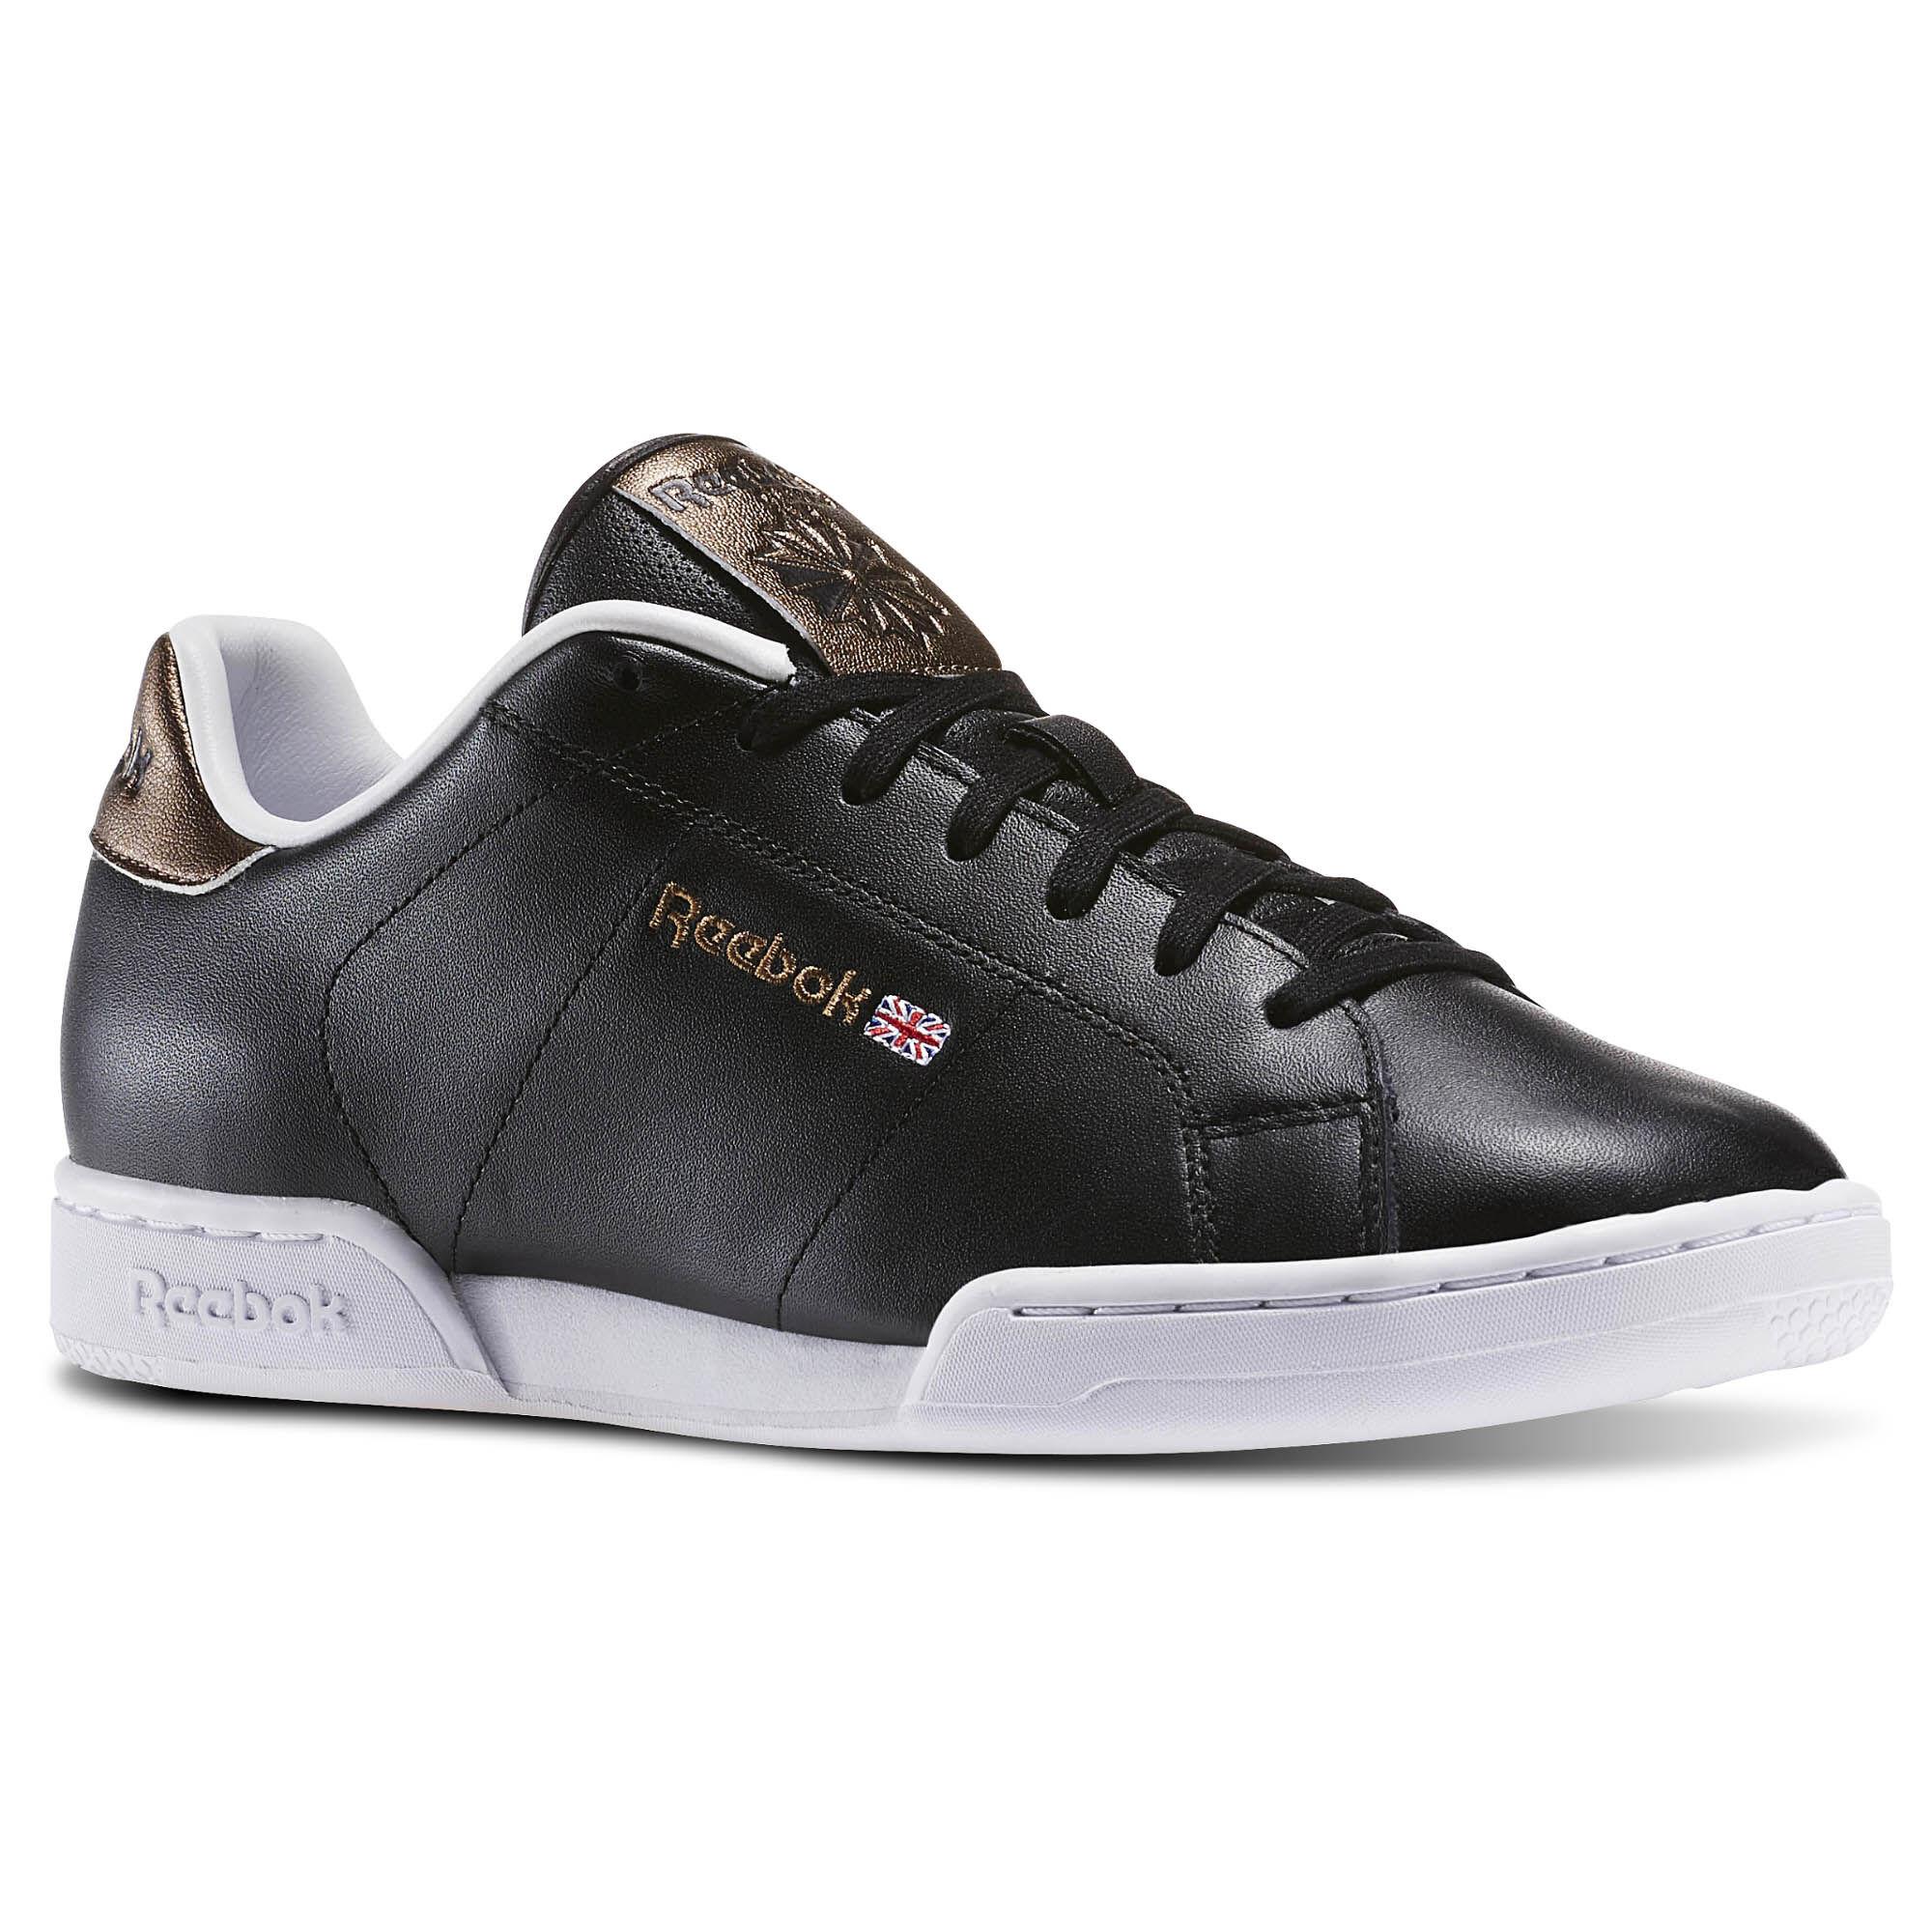 Zapatos Reebok Clasicos 2016